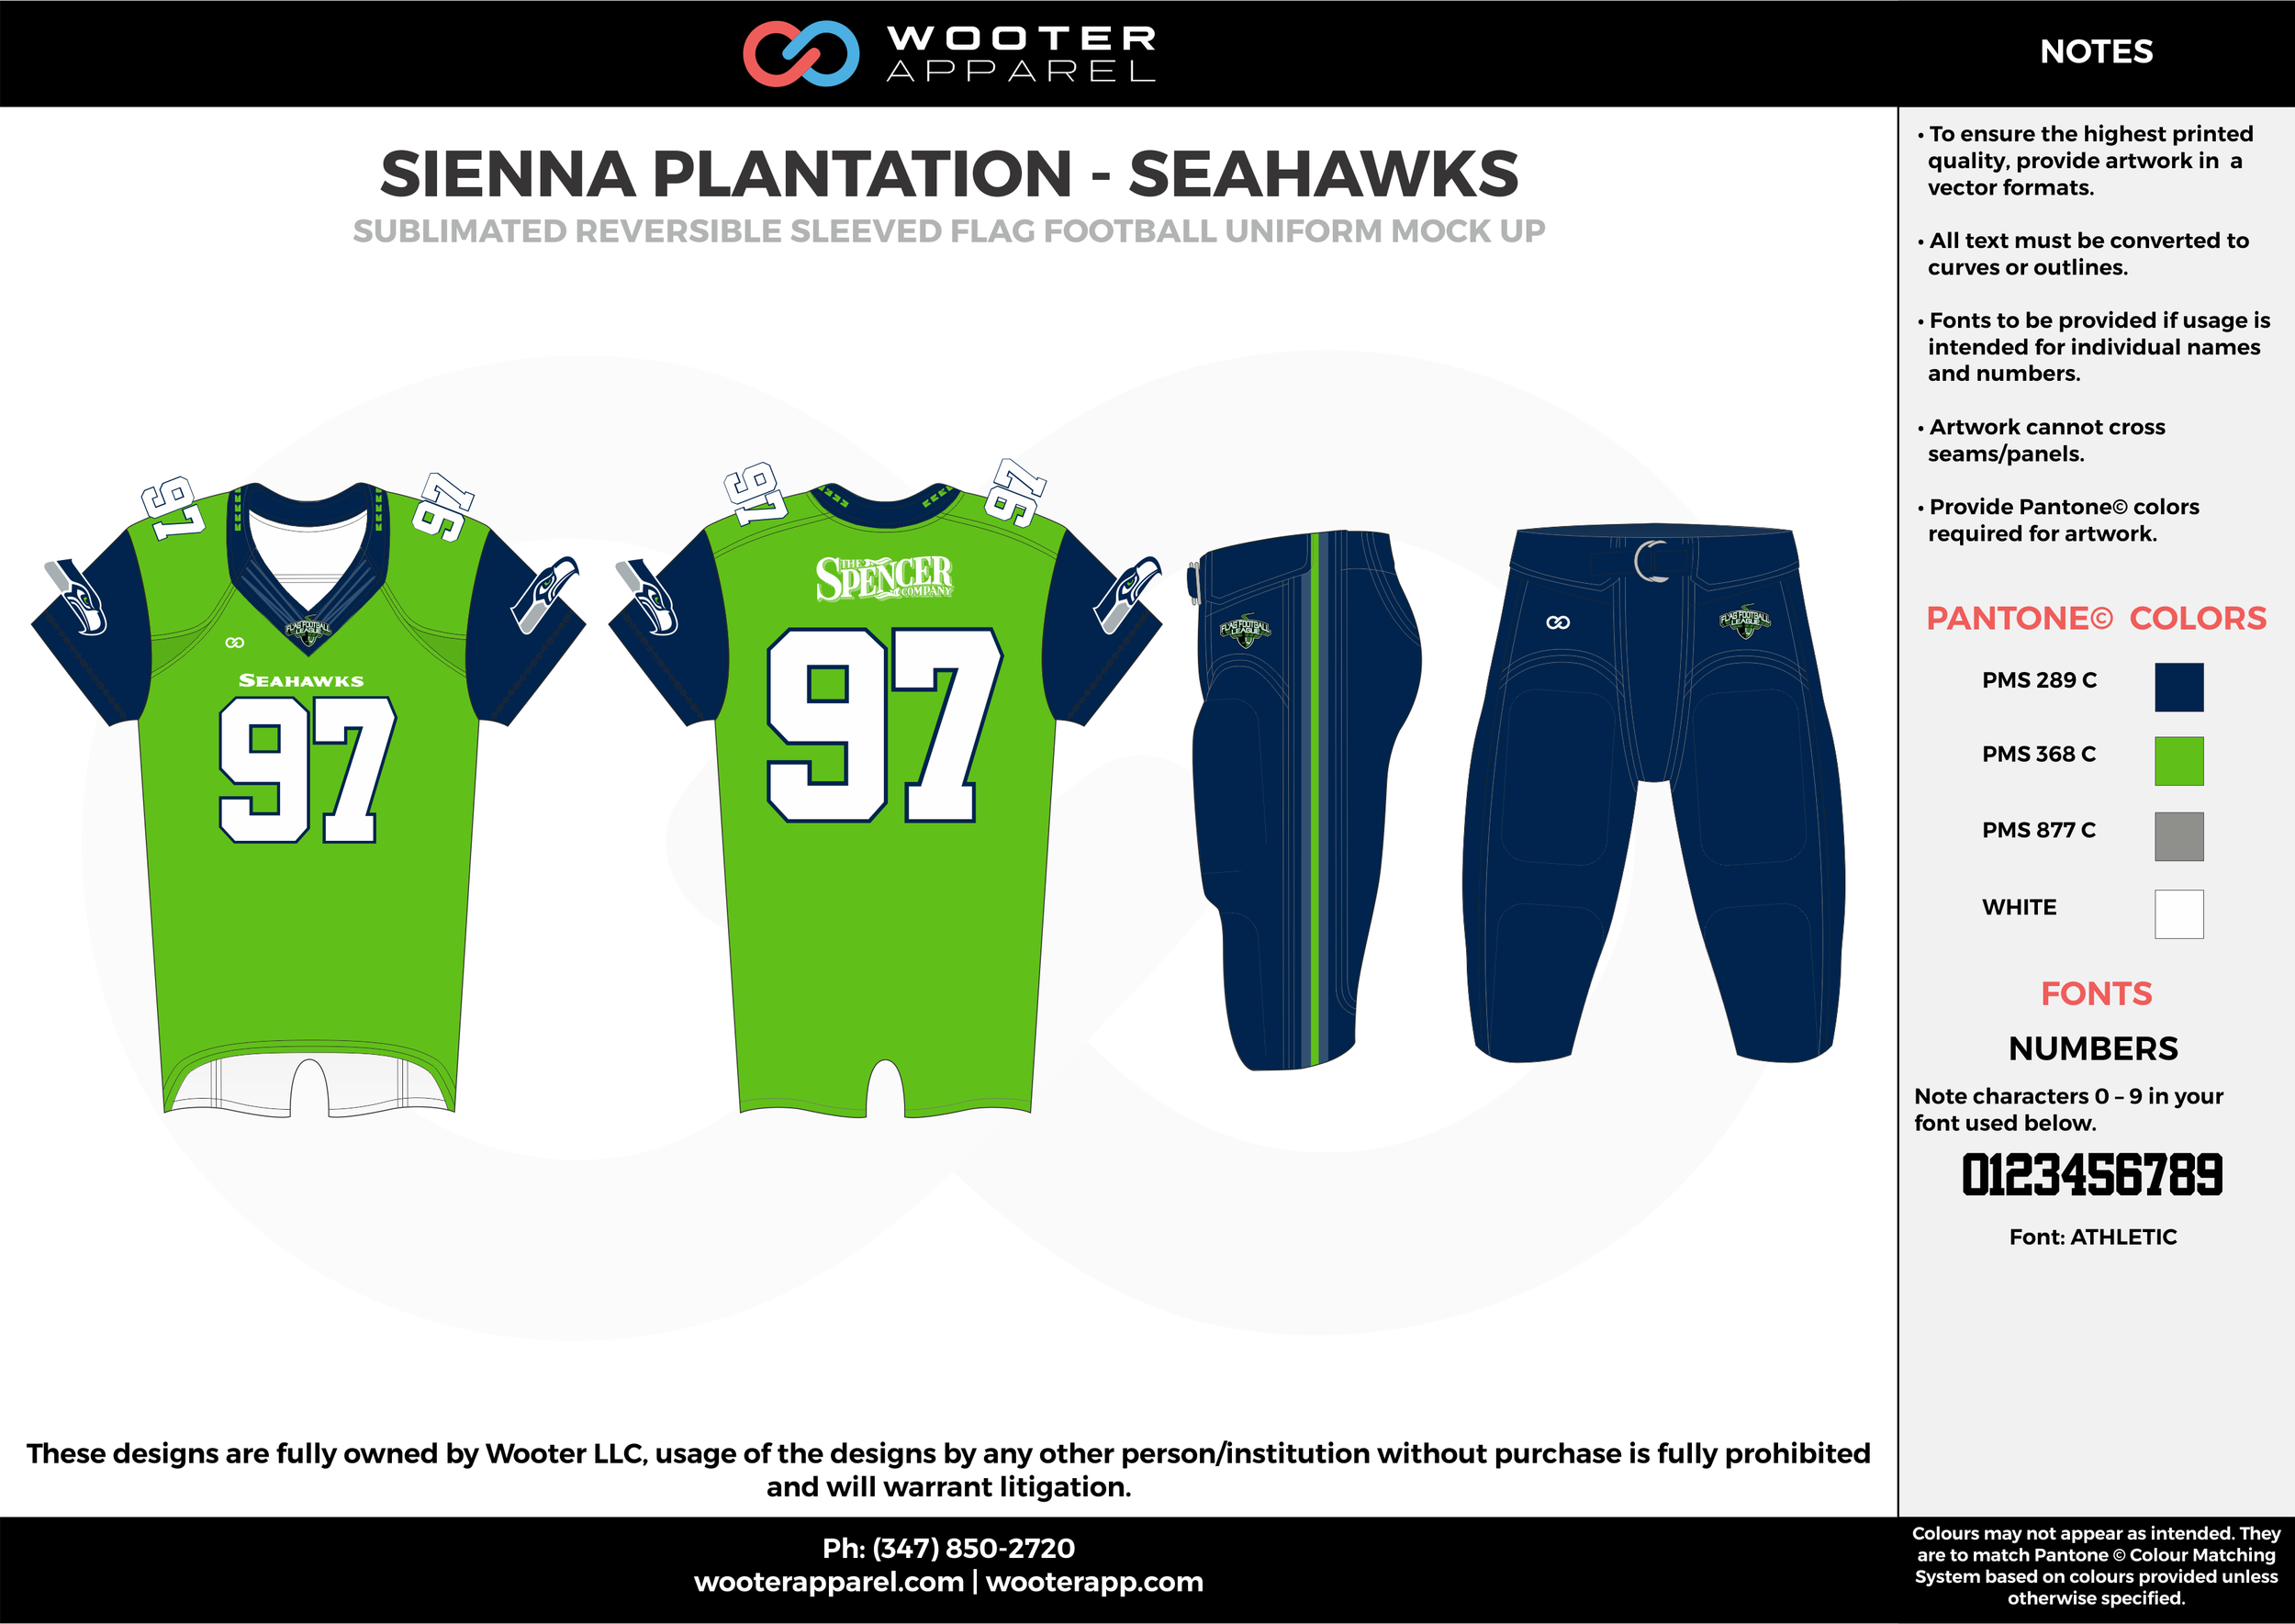 SIENNA PLANTATION - SEAHAWKS blue green gray white Football Uniform, Jersey, Pants, Integraded